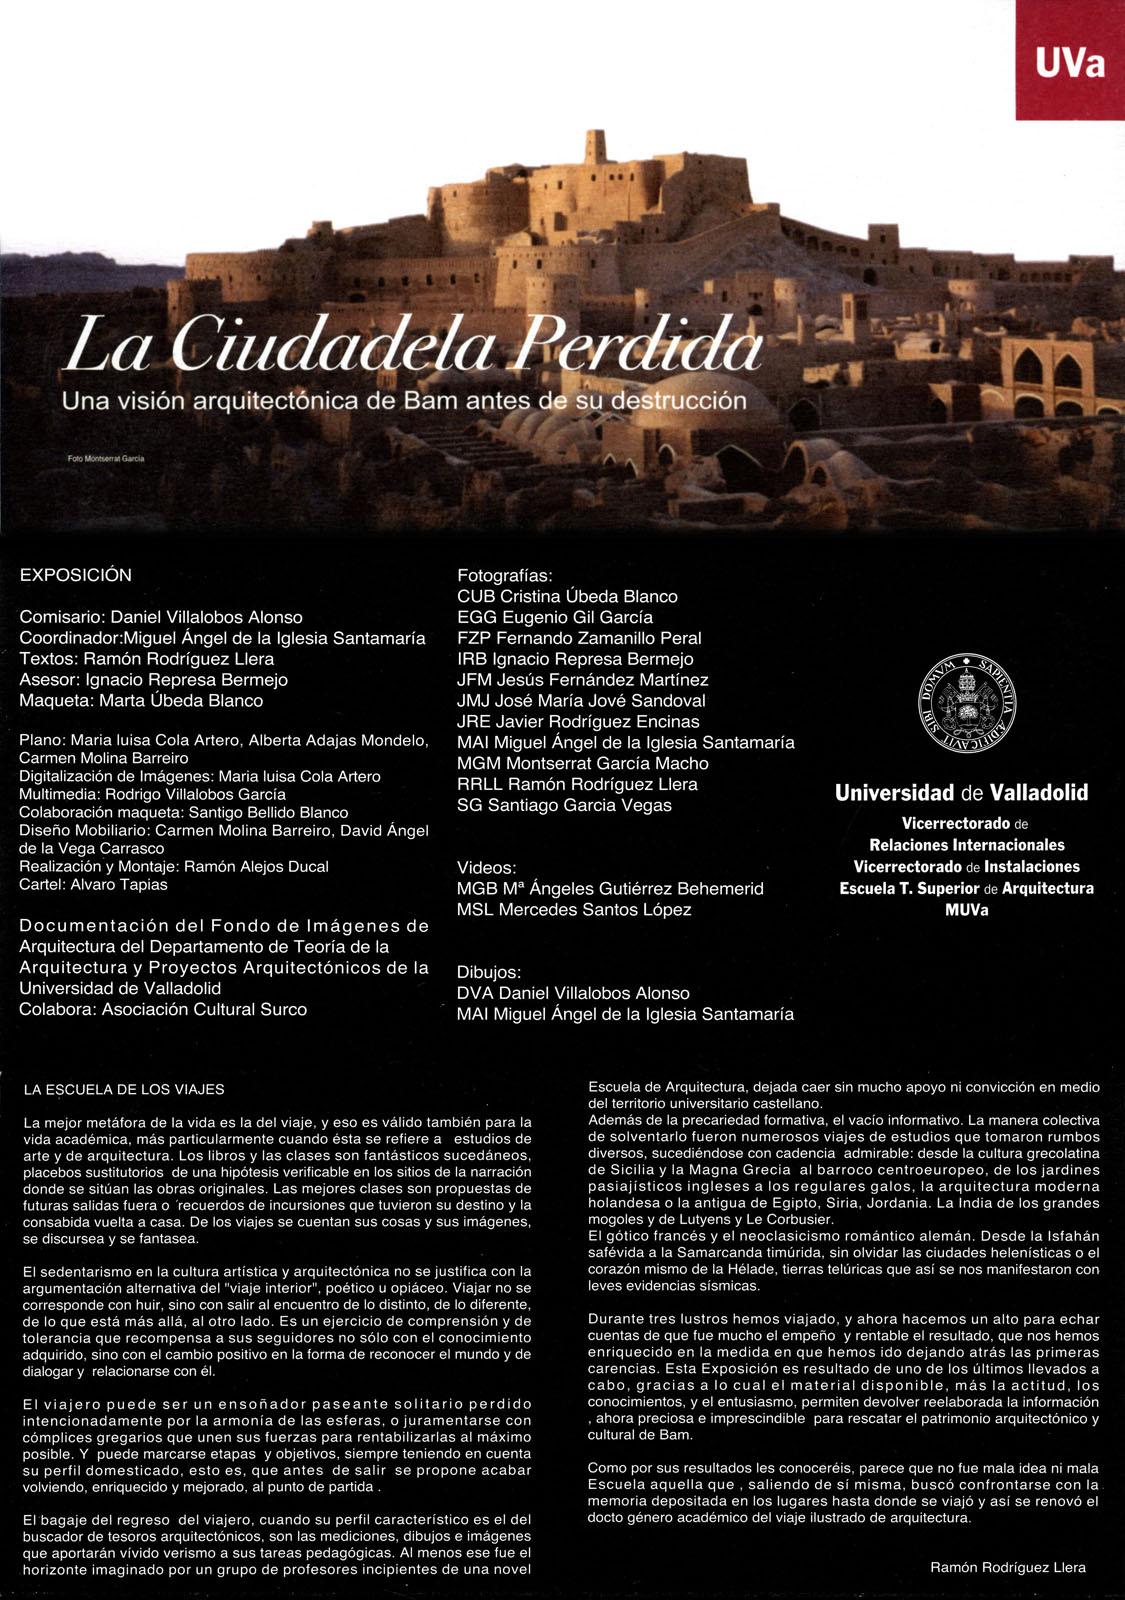 danielvillalobos-architecturalexhibition-bam-architectureofmud-4